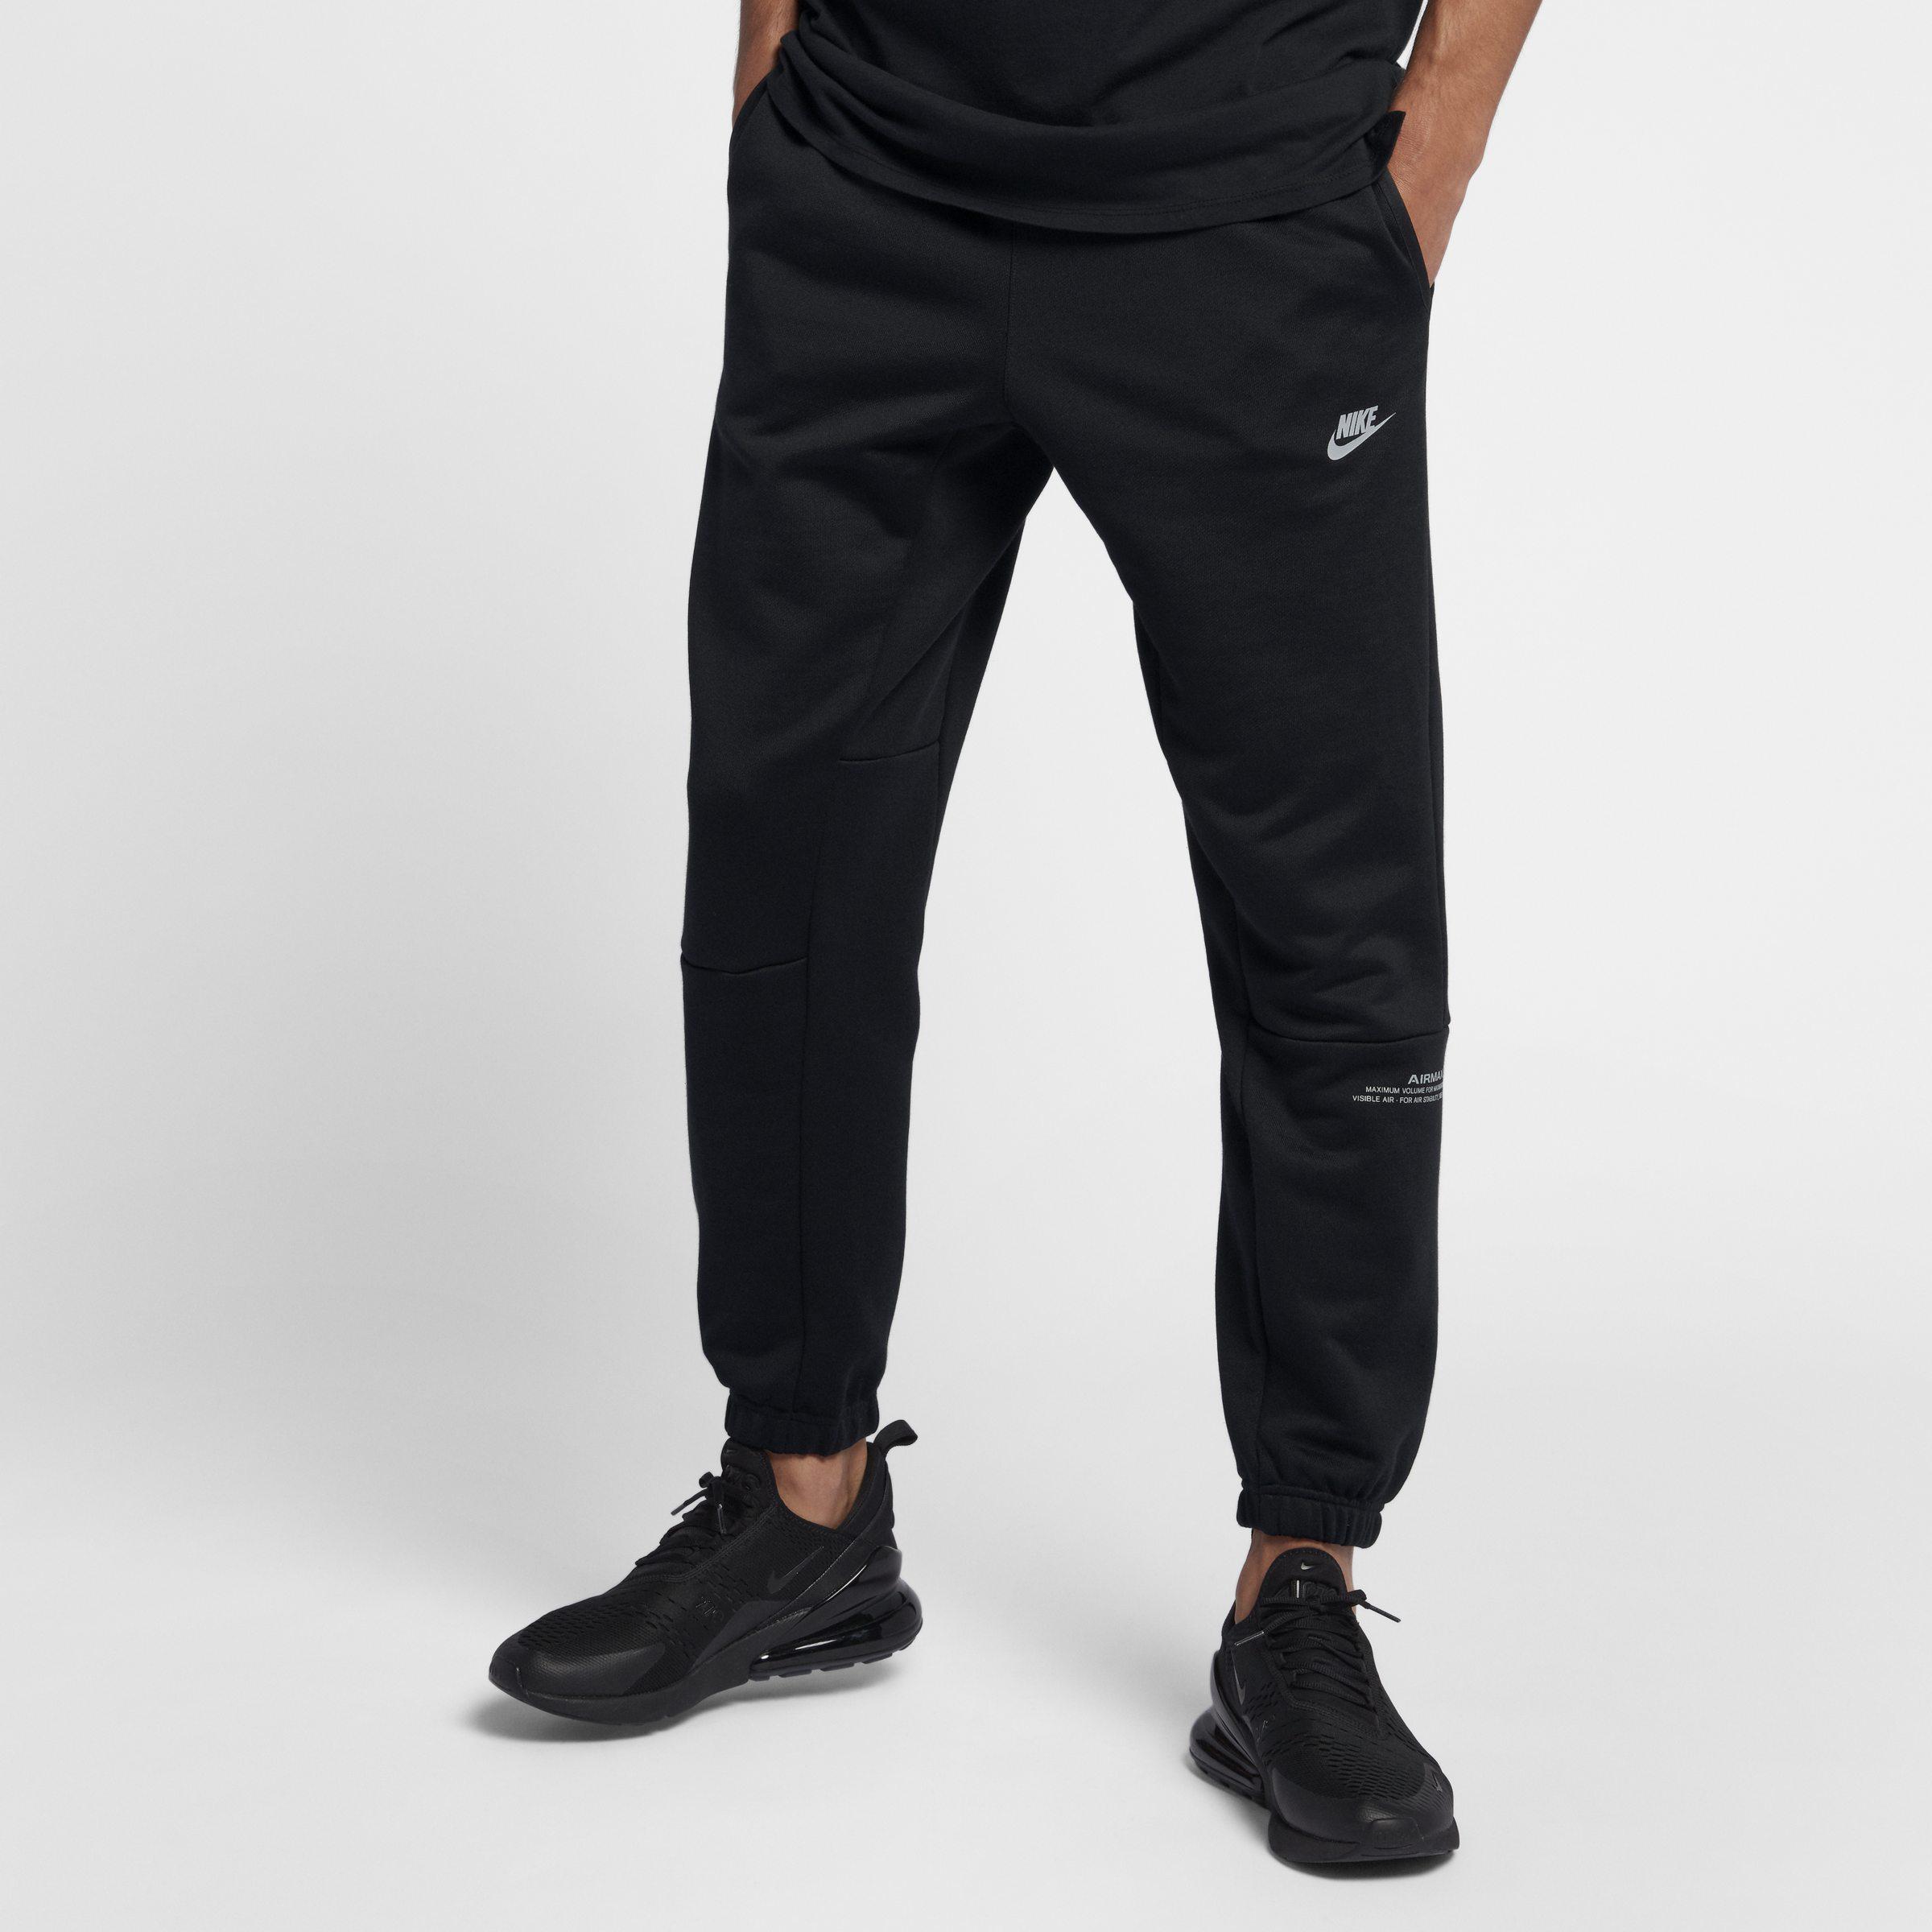 Nike Sportswear Air Max Joggers in